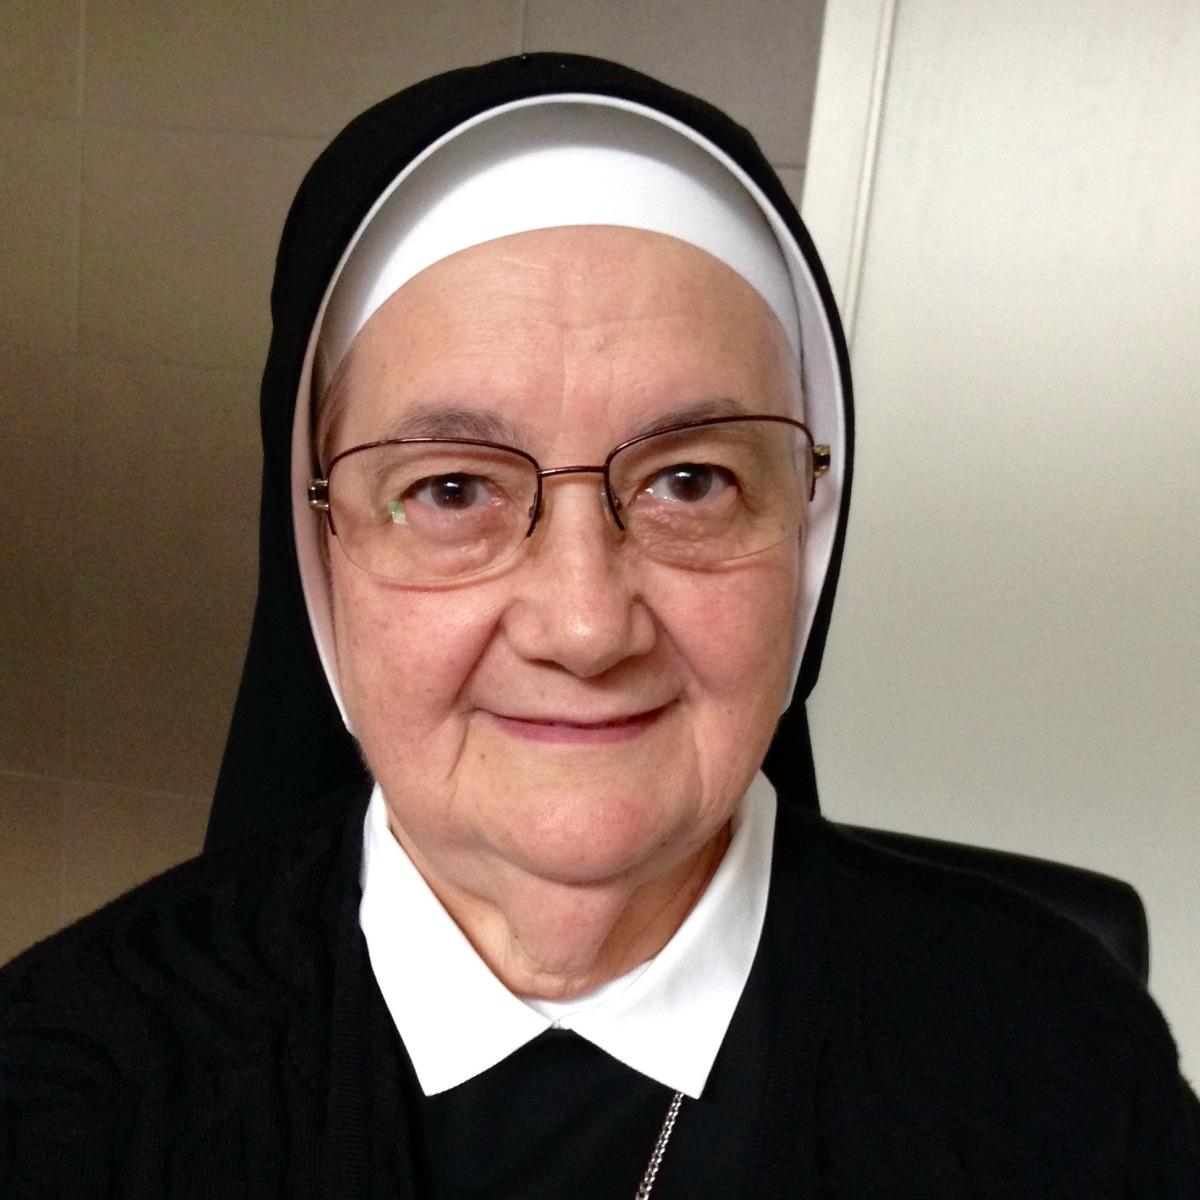 Suor Paolisa Teresa Falconi